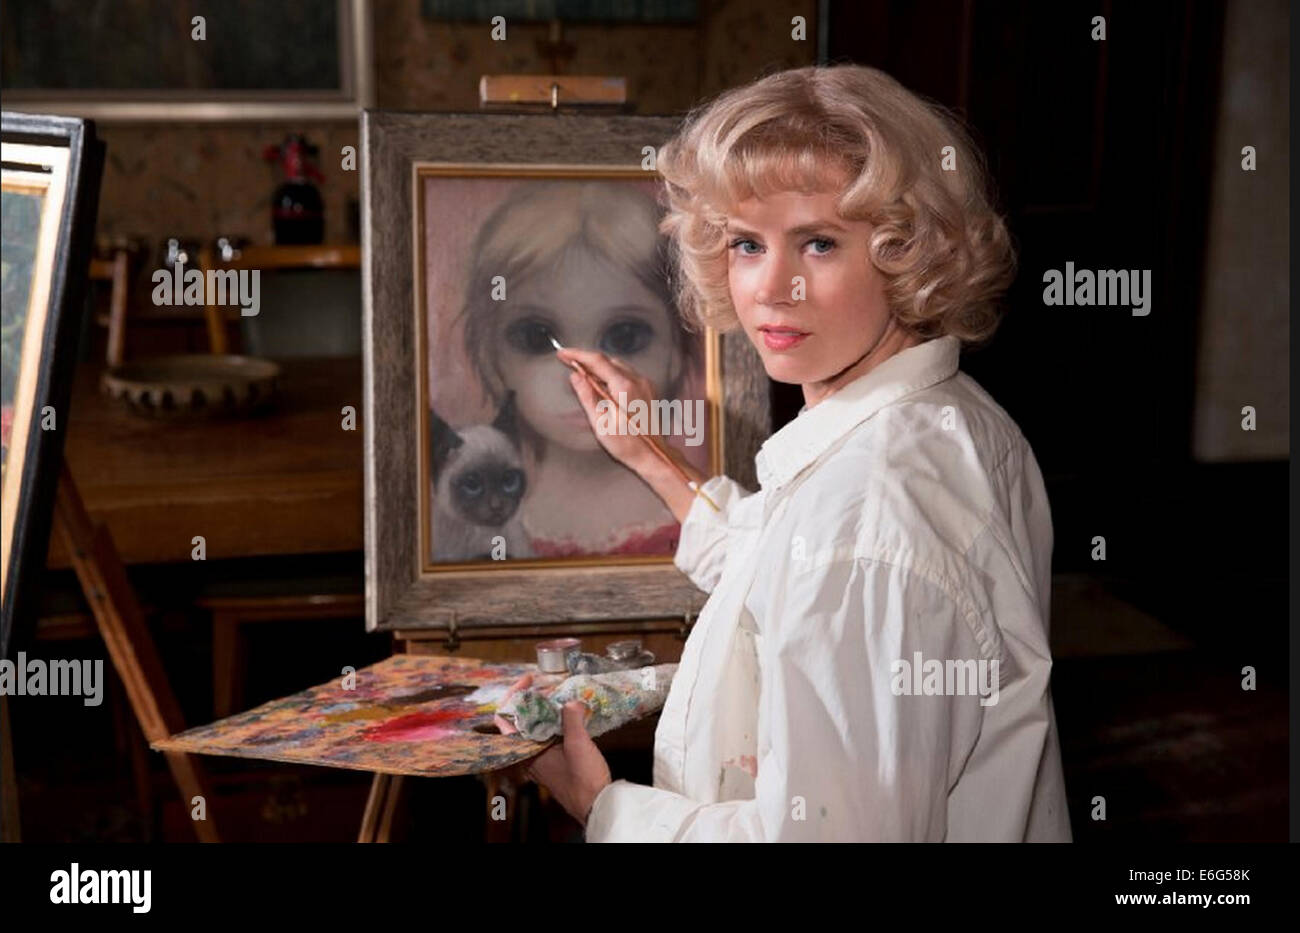 BIG EYES 2014 Weinstein Company film with Amy Adams - Stock Image